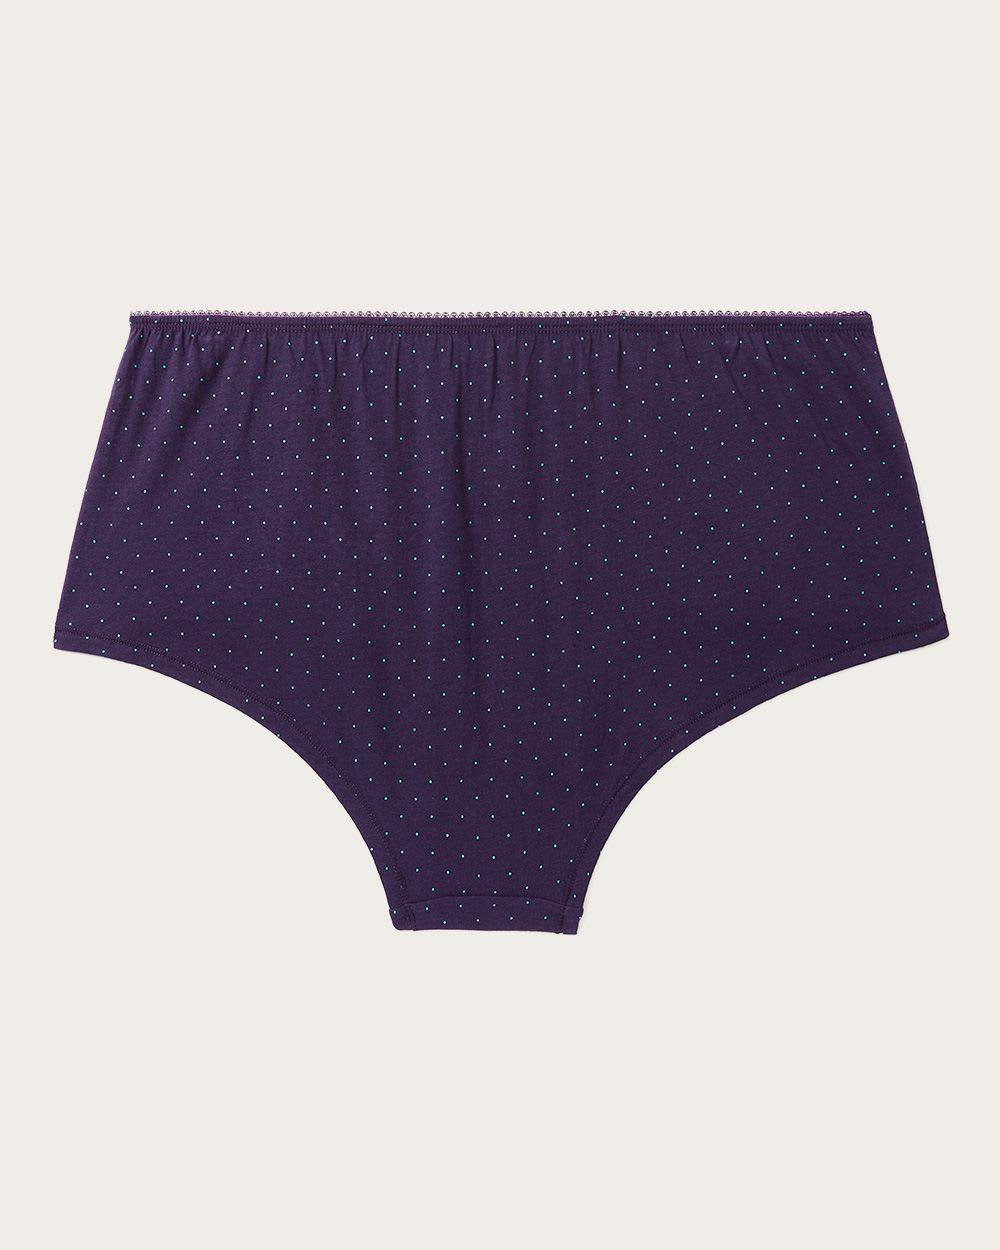 4c3f60ec434b3 Lyst - Addition Elle Polka Dot Cotton Boyshort Panty - Ti Voglio in Purple